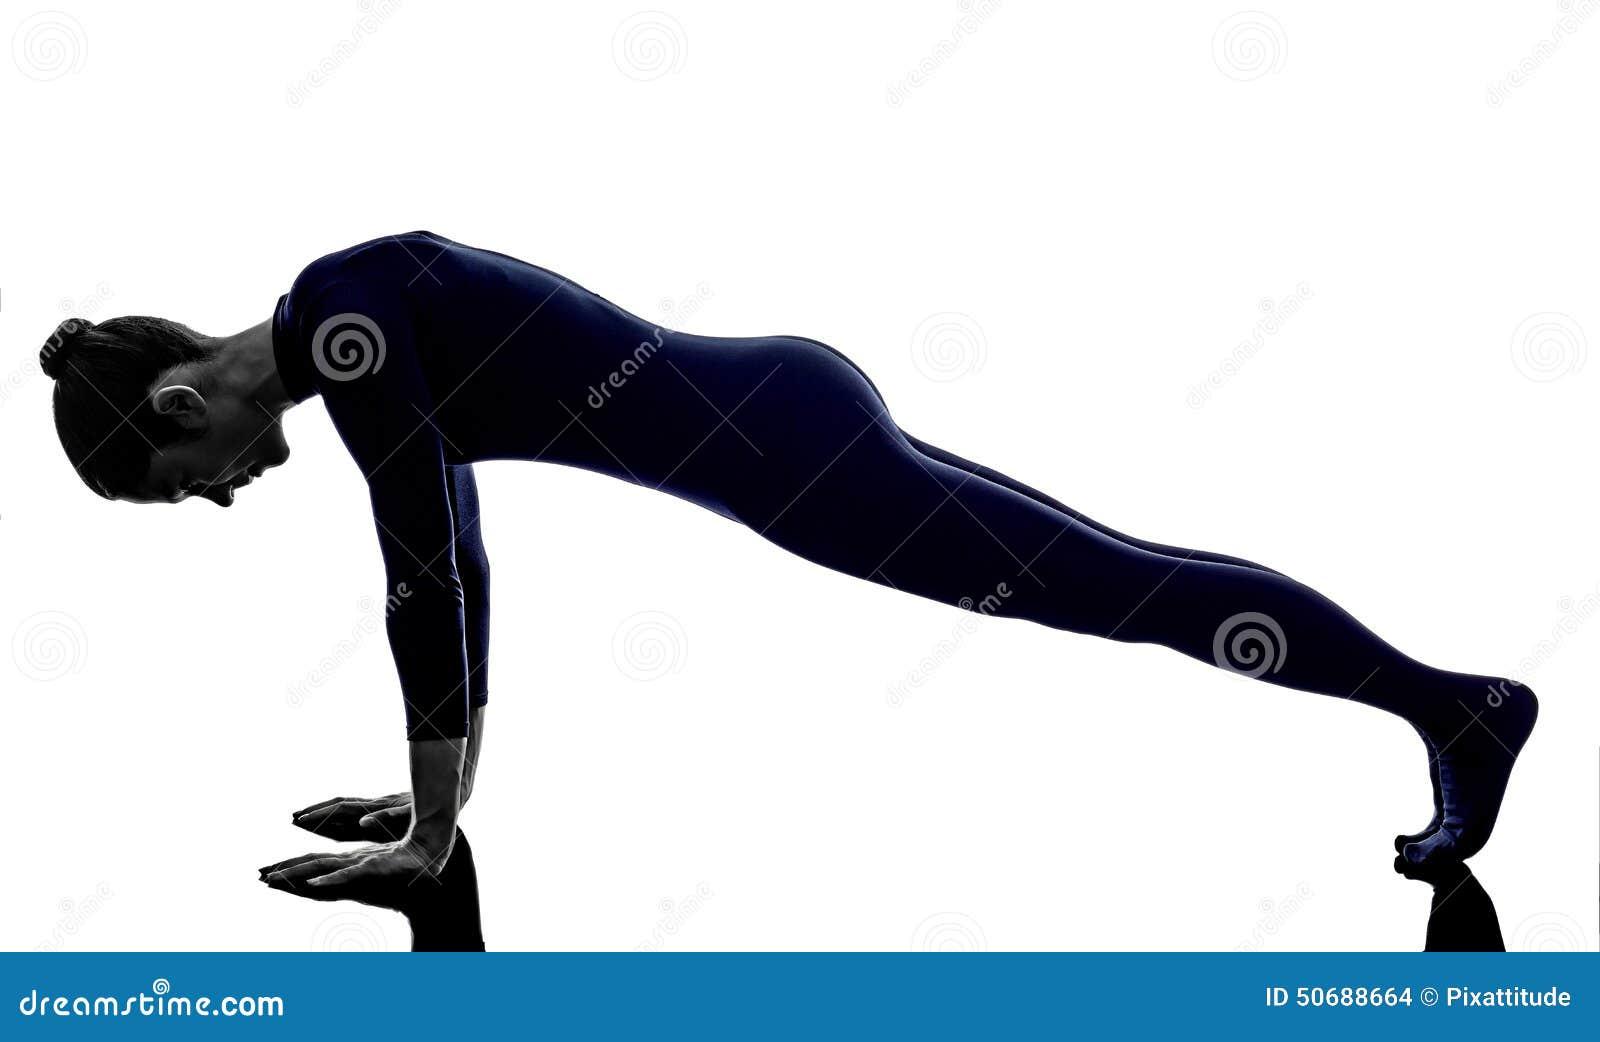 Download 行使dandasana板条姿势瑜伽剪影的妇女 库存照片. 图片 包括有 执行, 健身, 培训, 剪影, 背包 - 50688664